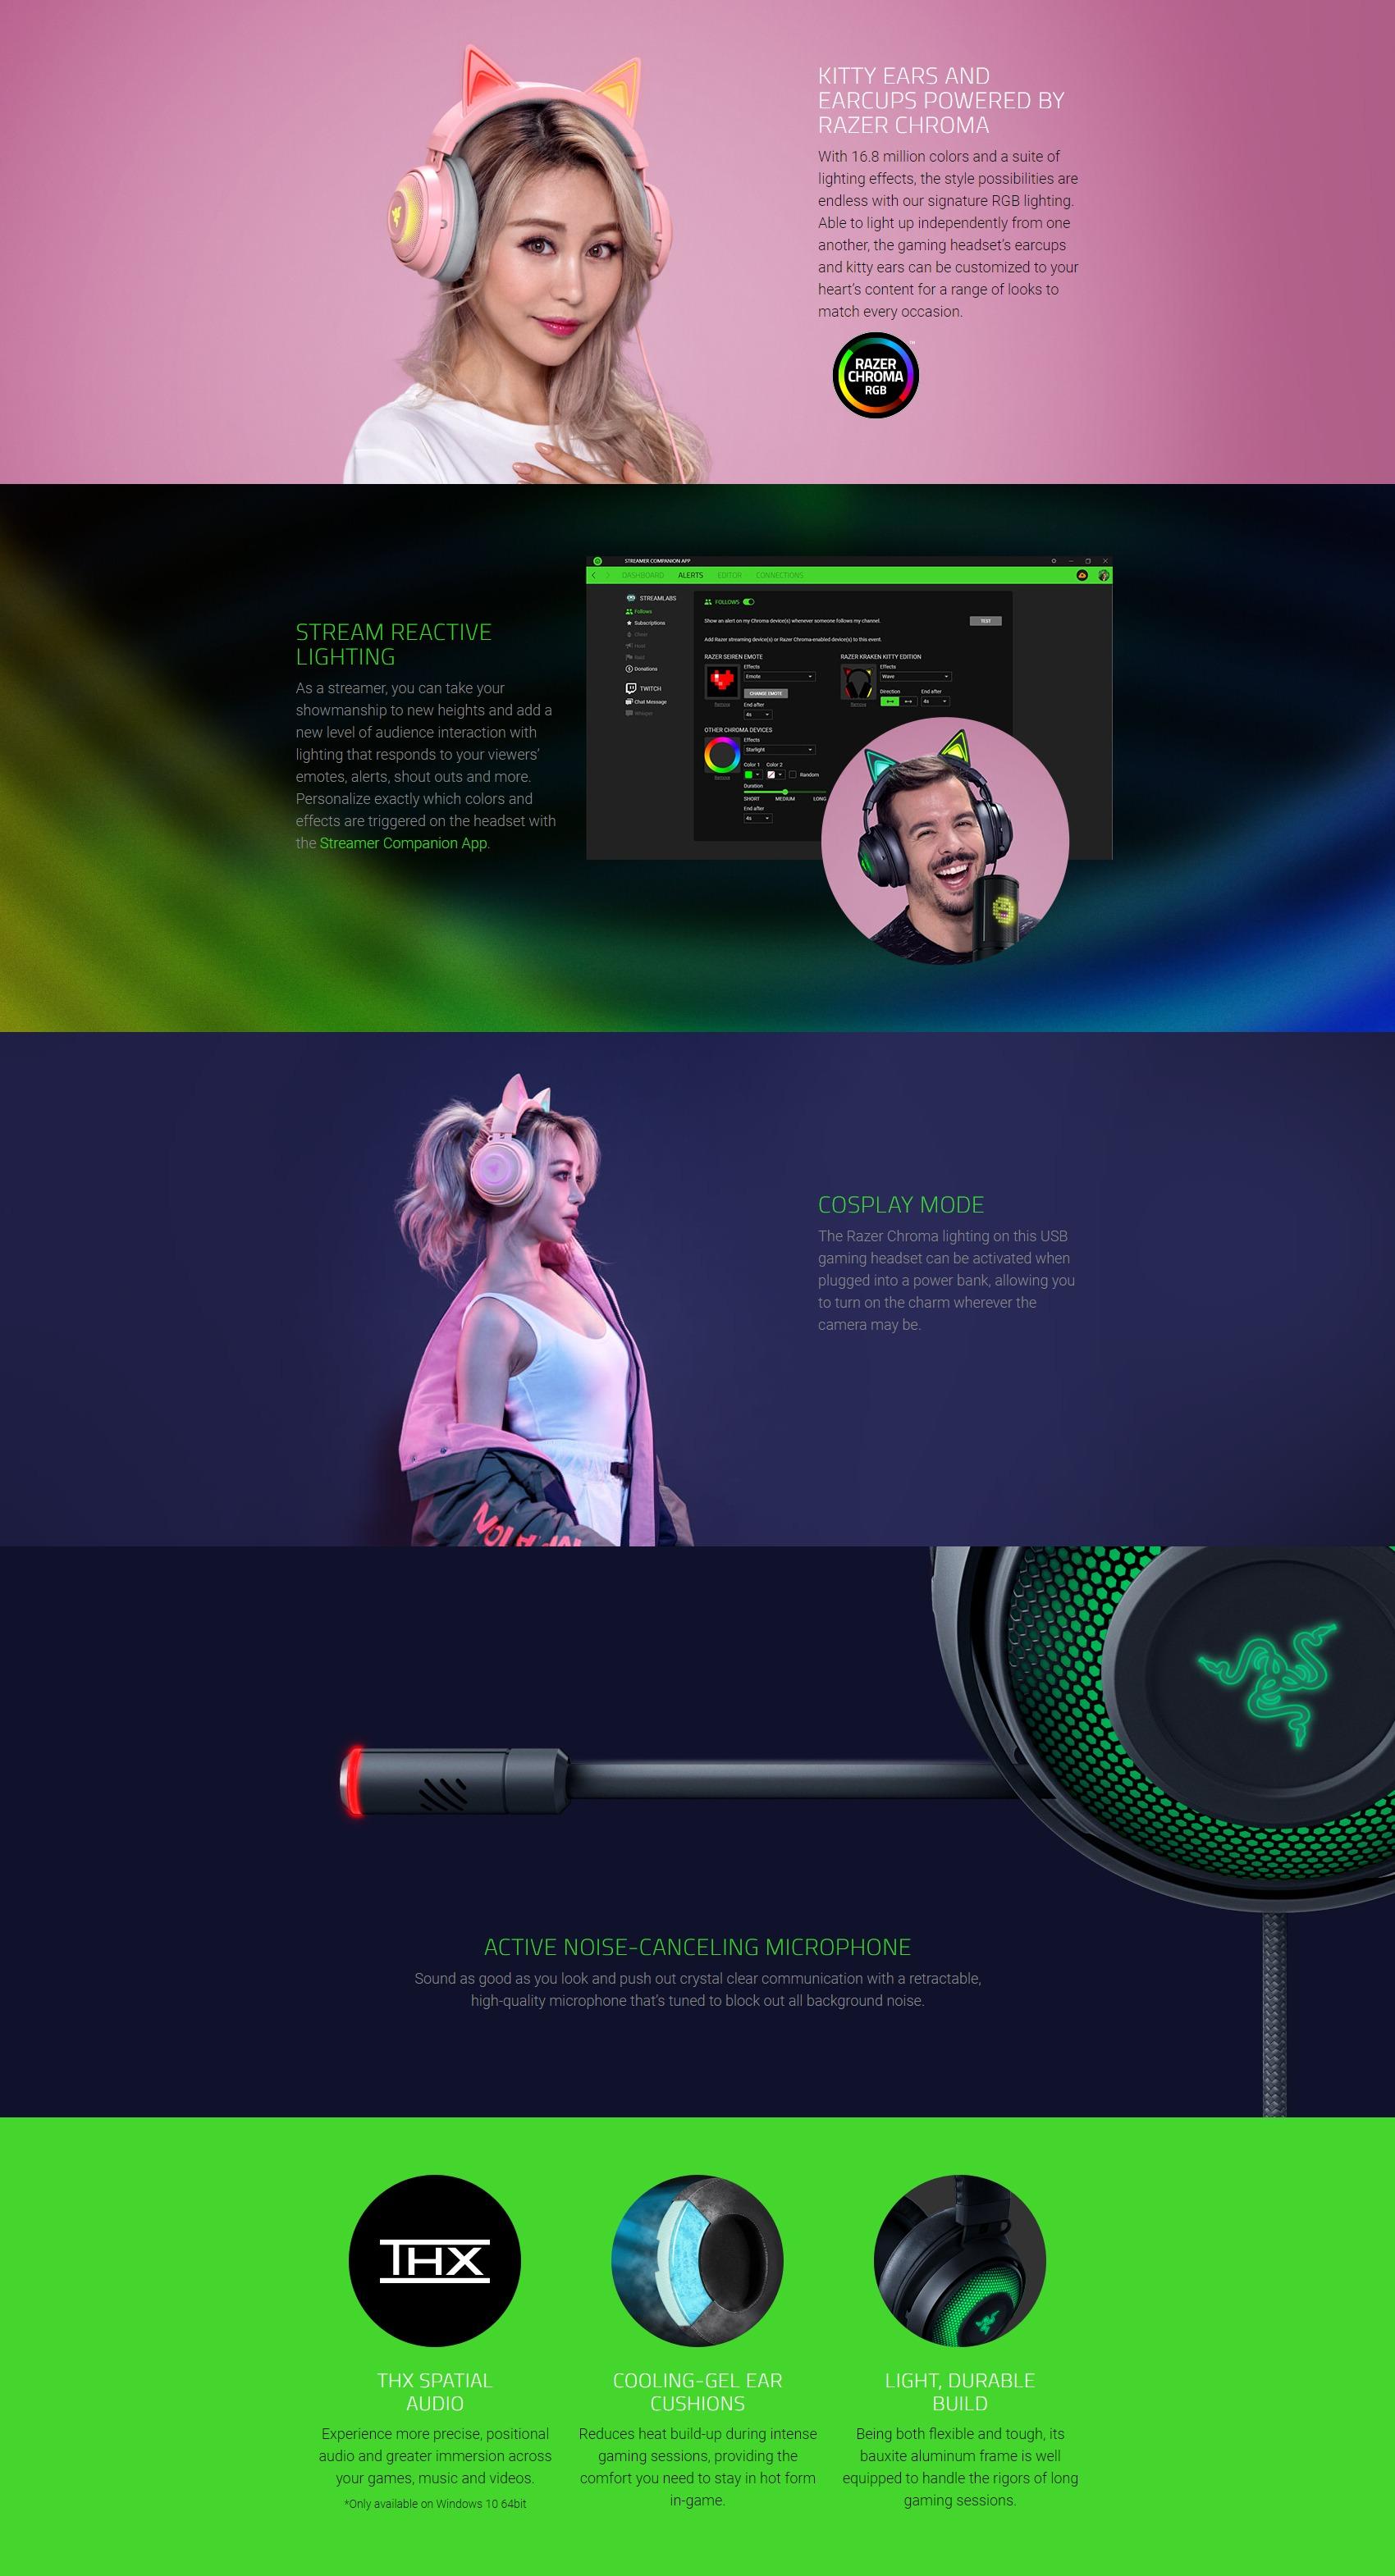 A large marketing image providing additional information about the product Razer Kraken Kitty - Chroma USB Gaming Headset - Black - Additional alt info not provided